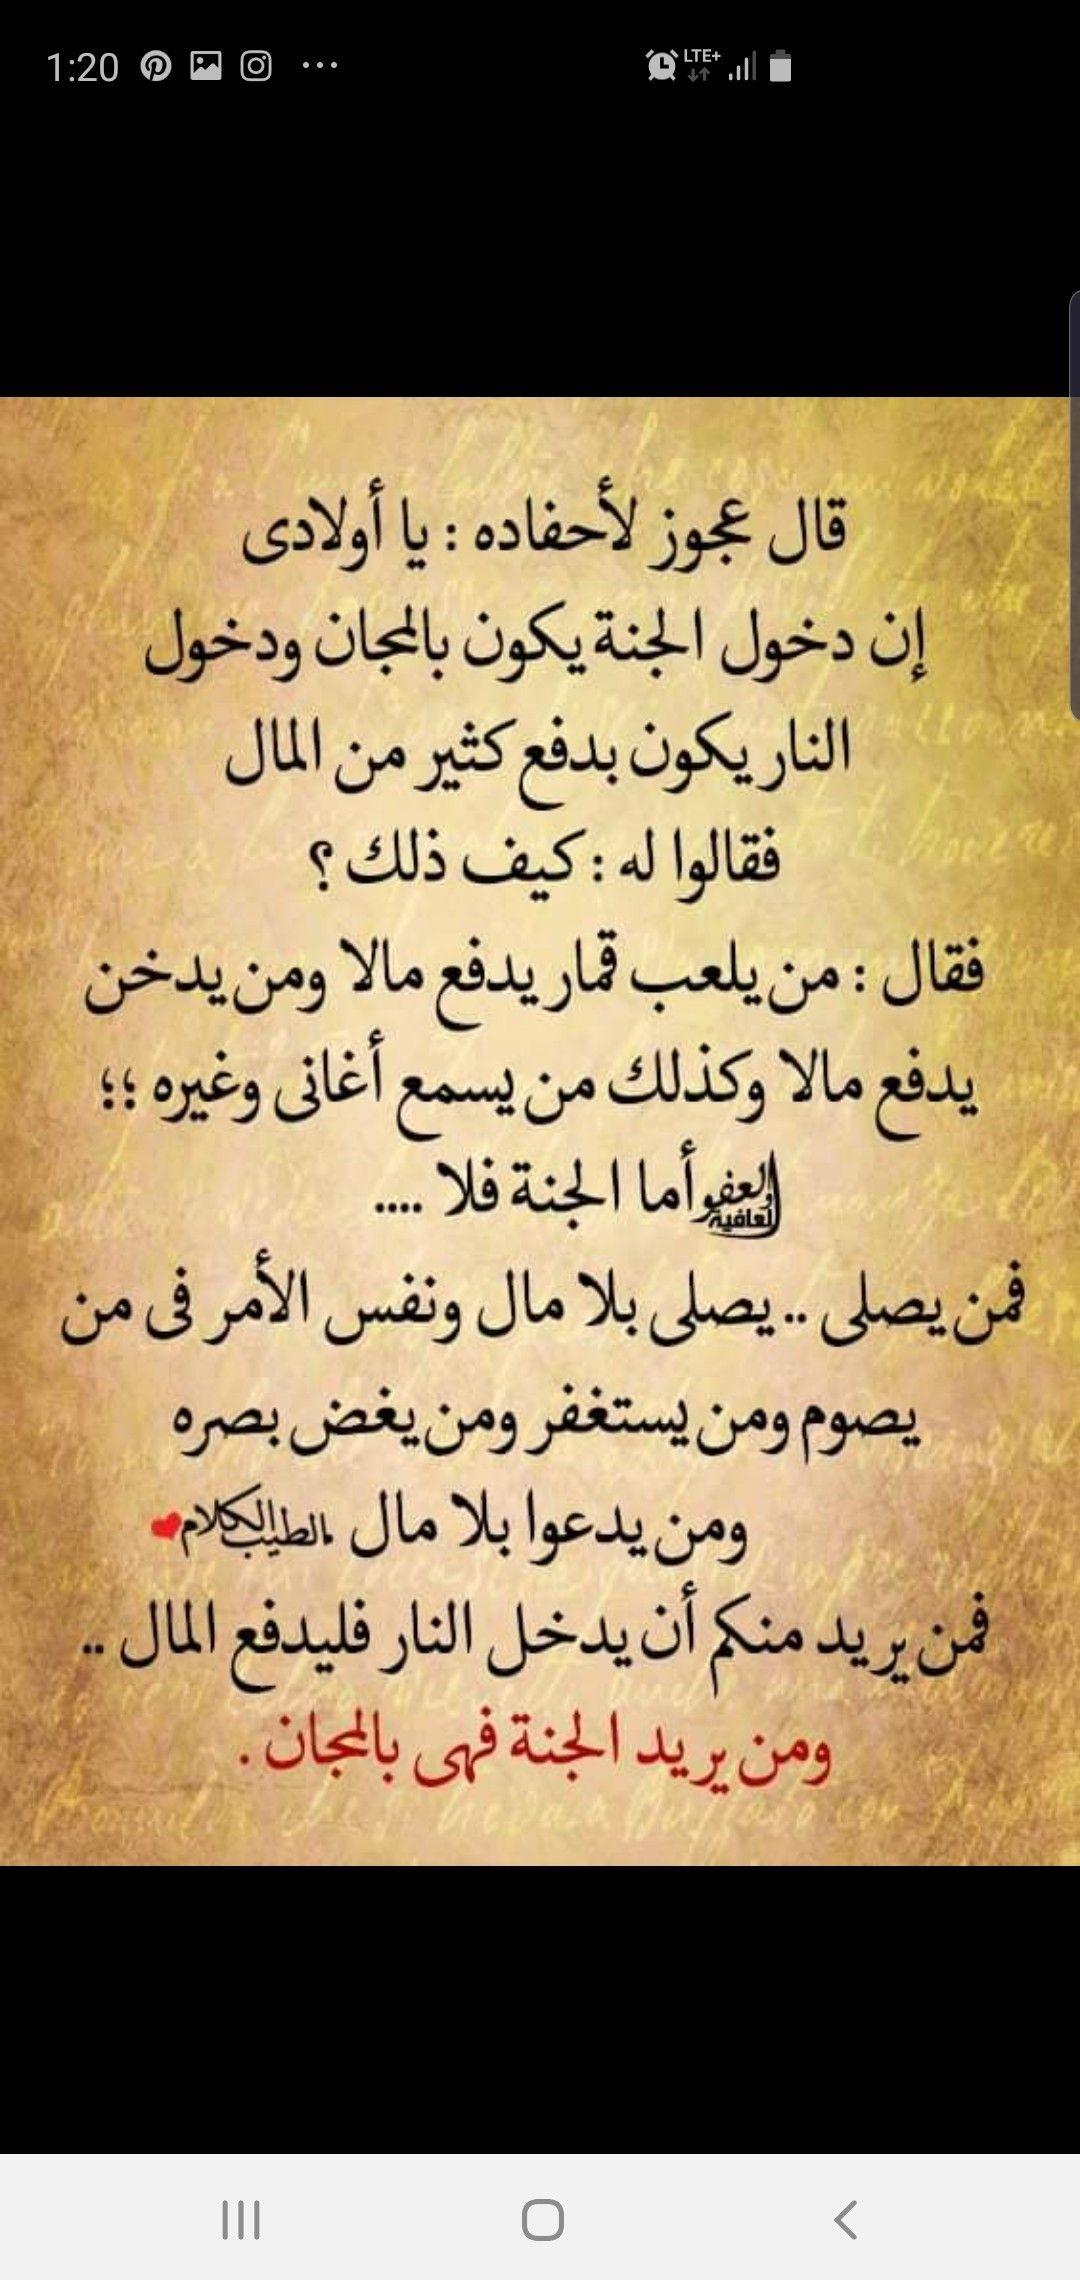 Pin By The Noble Quran On I Love Allah Quran Islam The Prophet Miracles Hadith Heaven Prophets Faith Prayer Dua حكم وعبر احاديث الله اسلام قرآن دعاء Islamic Quotes Quotes Islam Quran